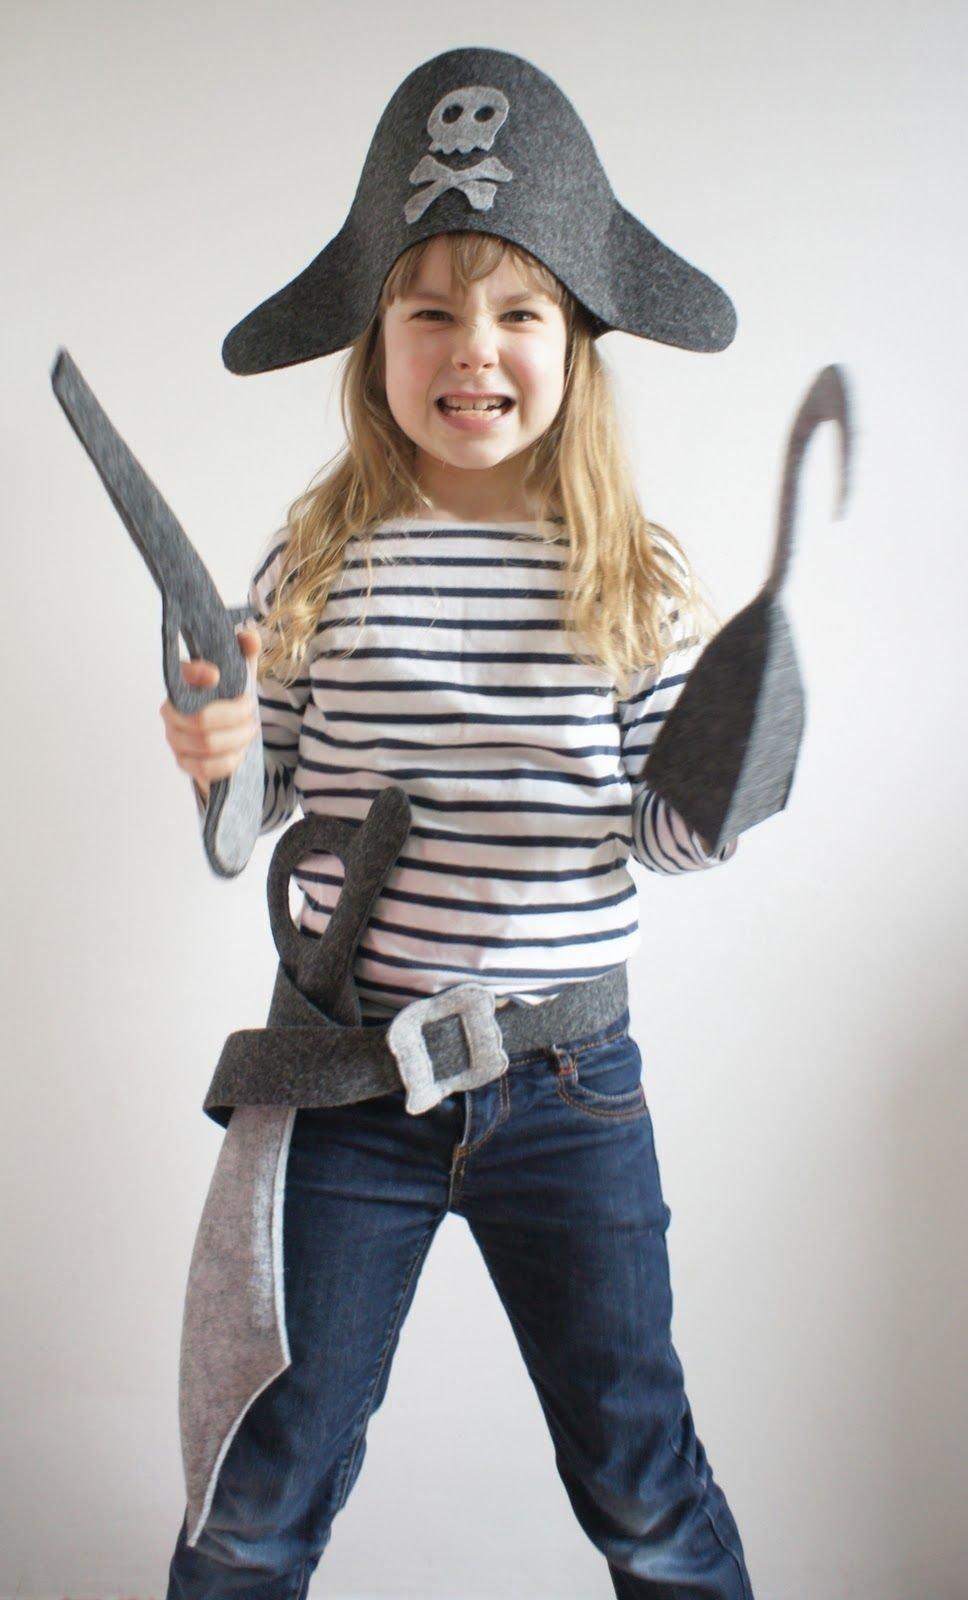 10 Attractive Homemade Pirate Costume Ideas For Kids pan pepe lena jako kapitan hak pirata play costumes pinterest 2020